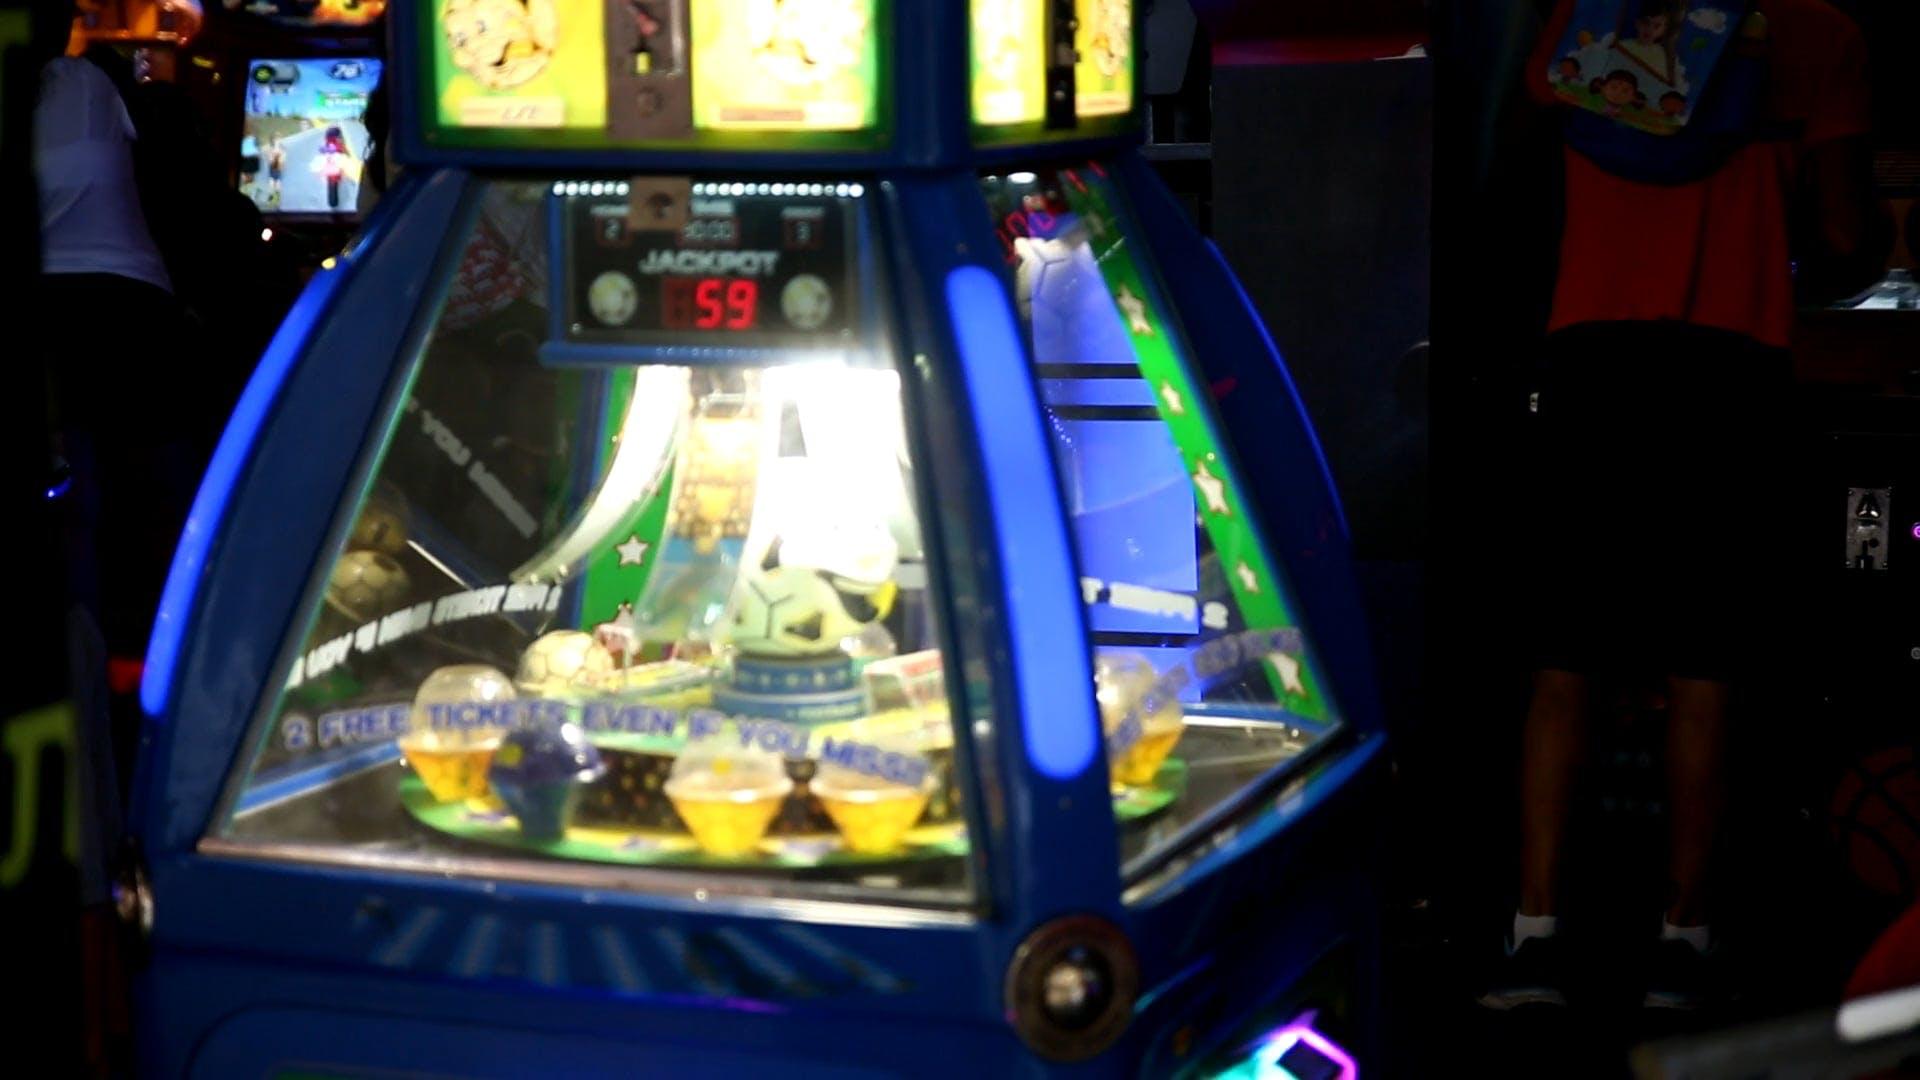 Amusement Center Game